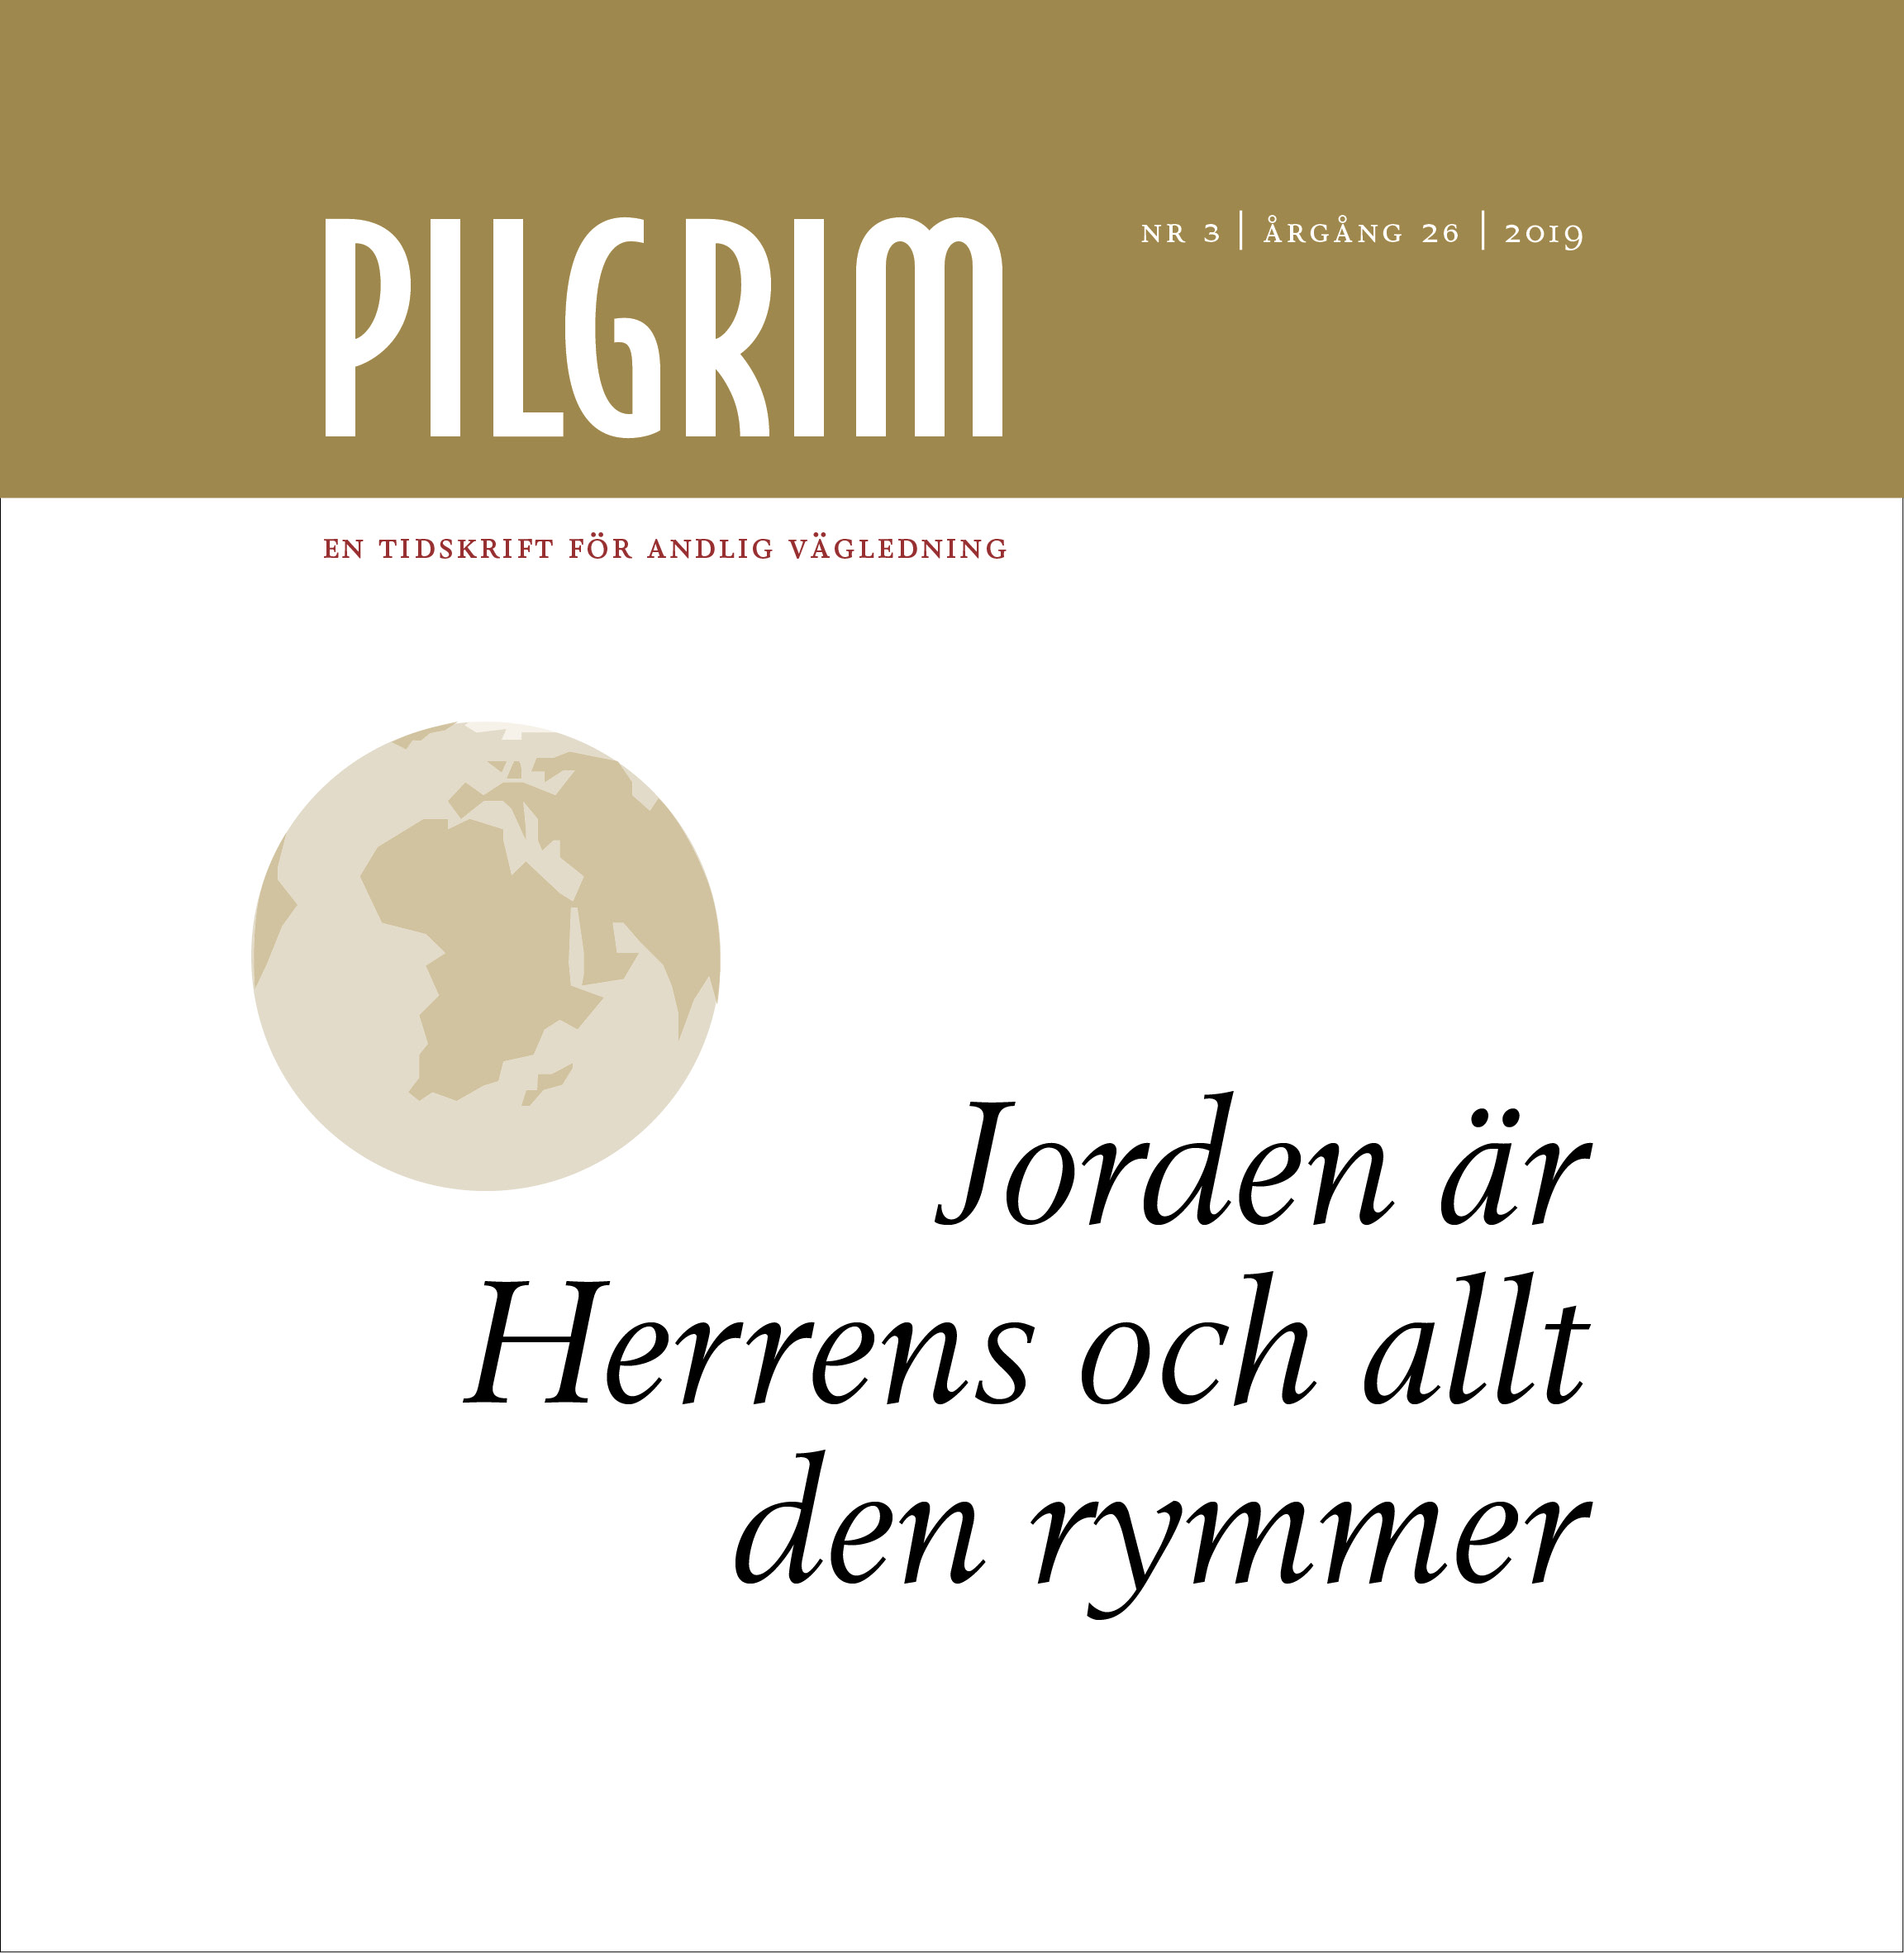 Pilgrim frams 2019-3